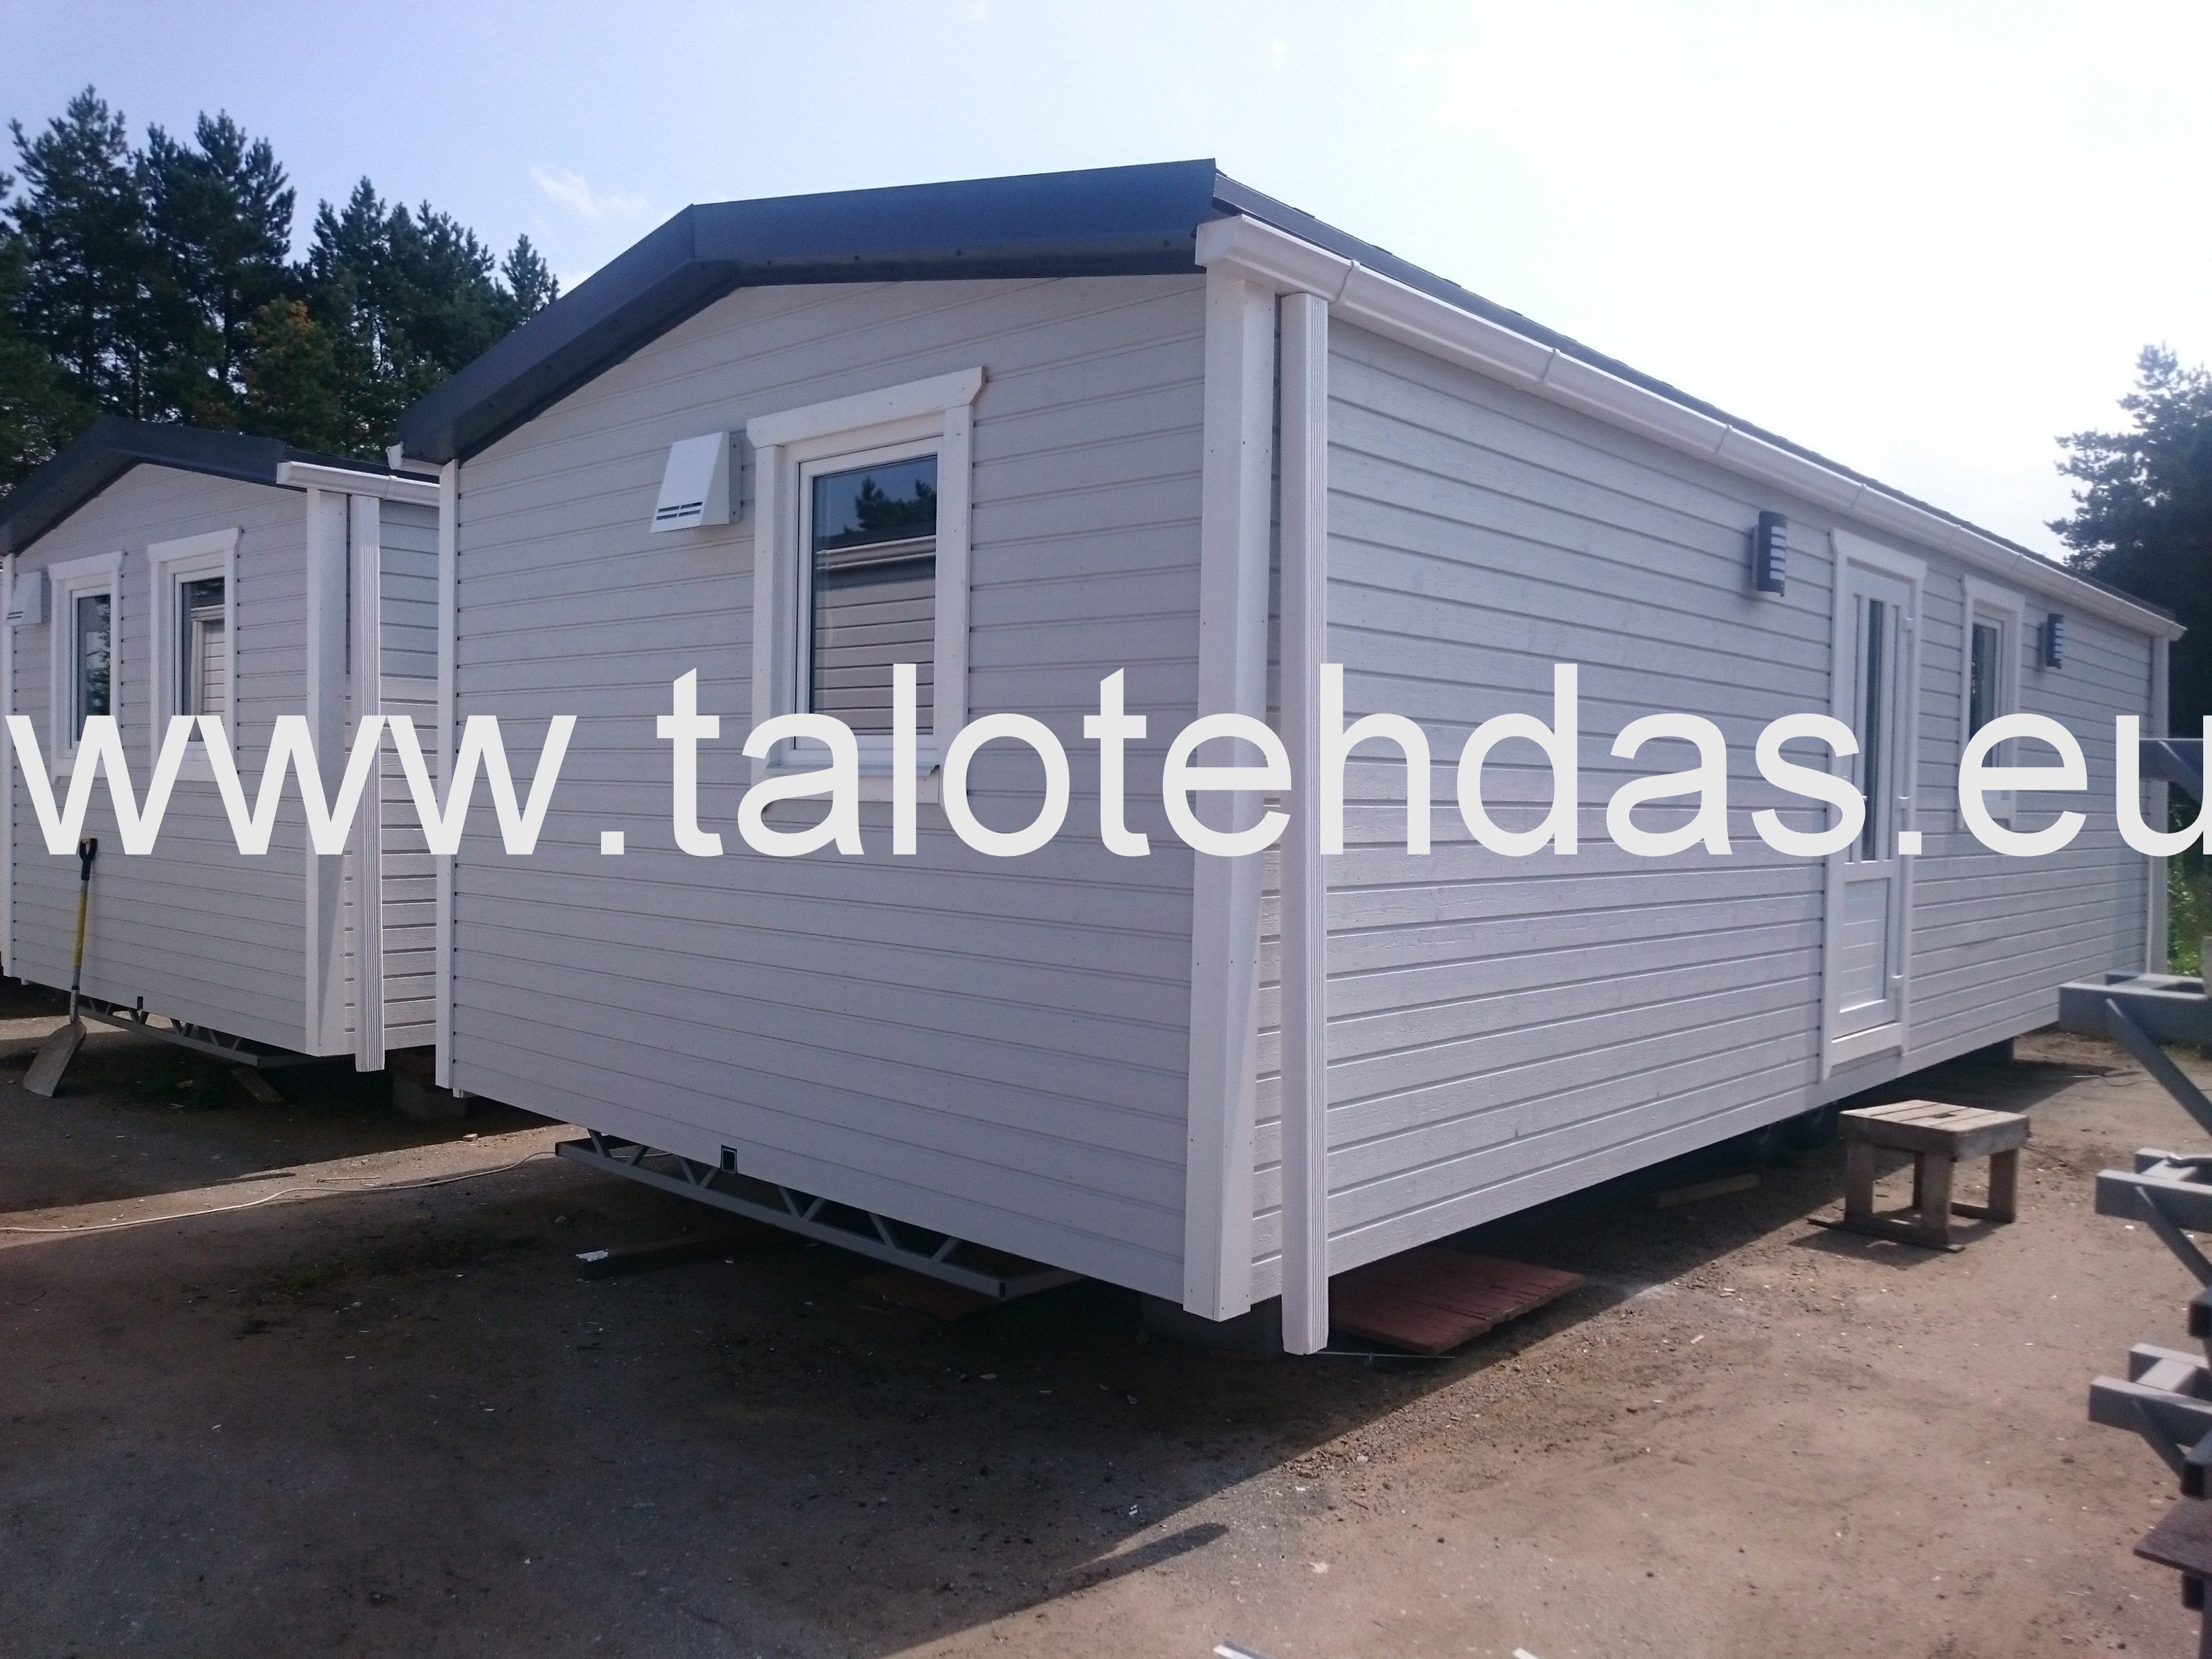 Talovaunu, mobile homes, 10x4 talotehdas.eu